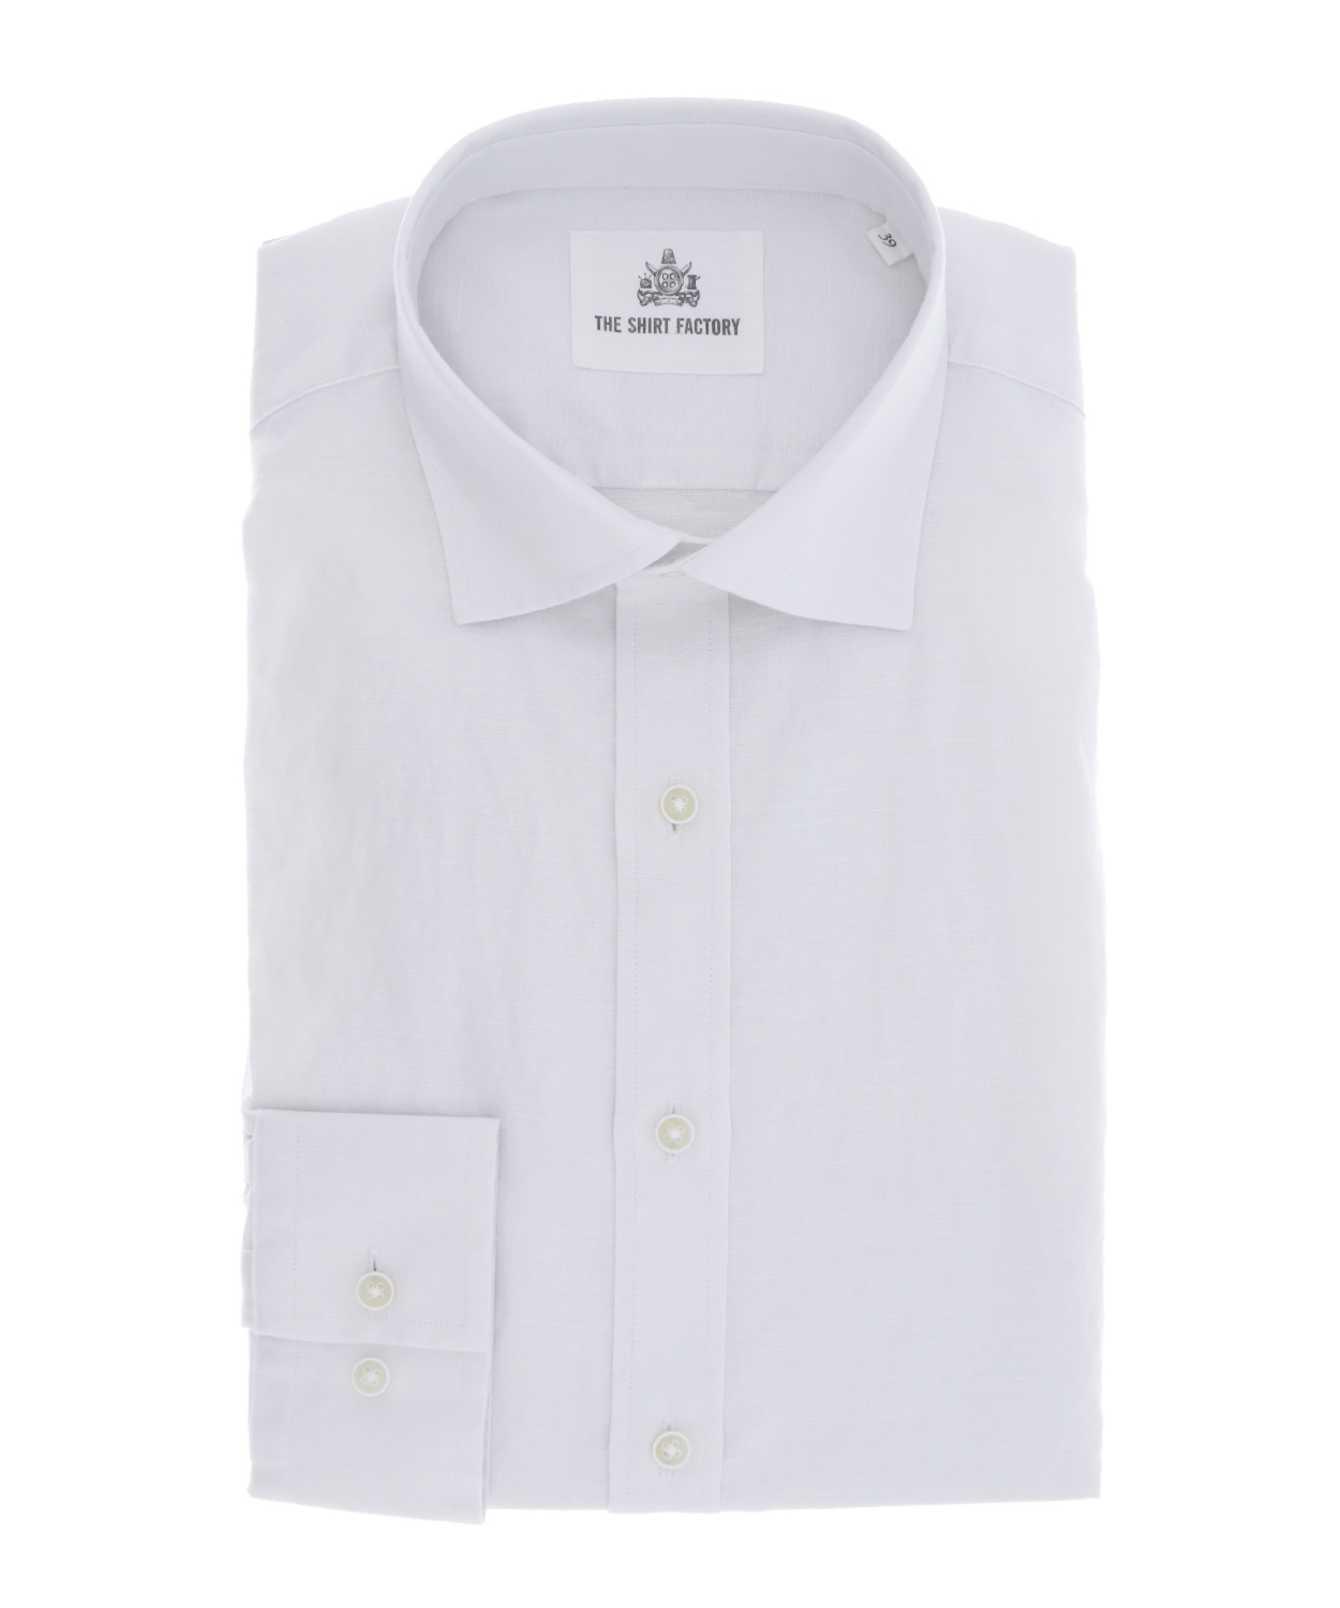 Shirt Portofino Linne Vit  The Shirt Factory